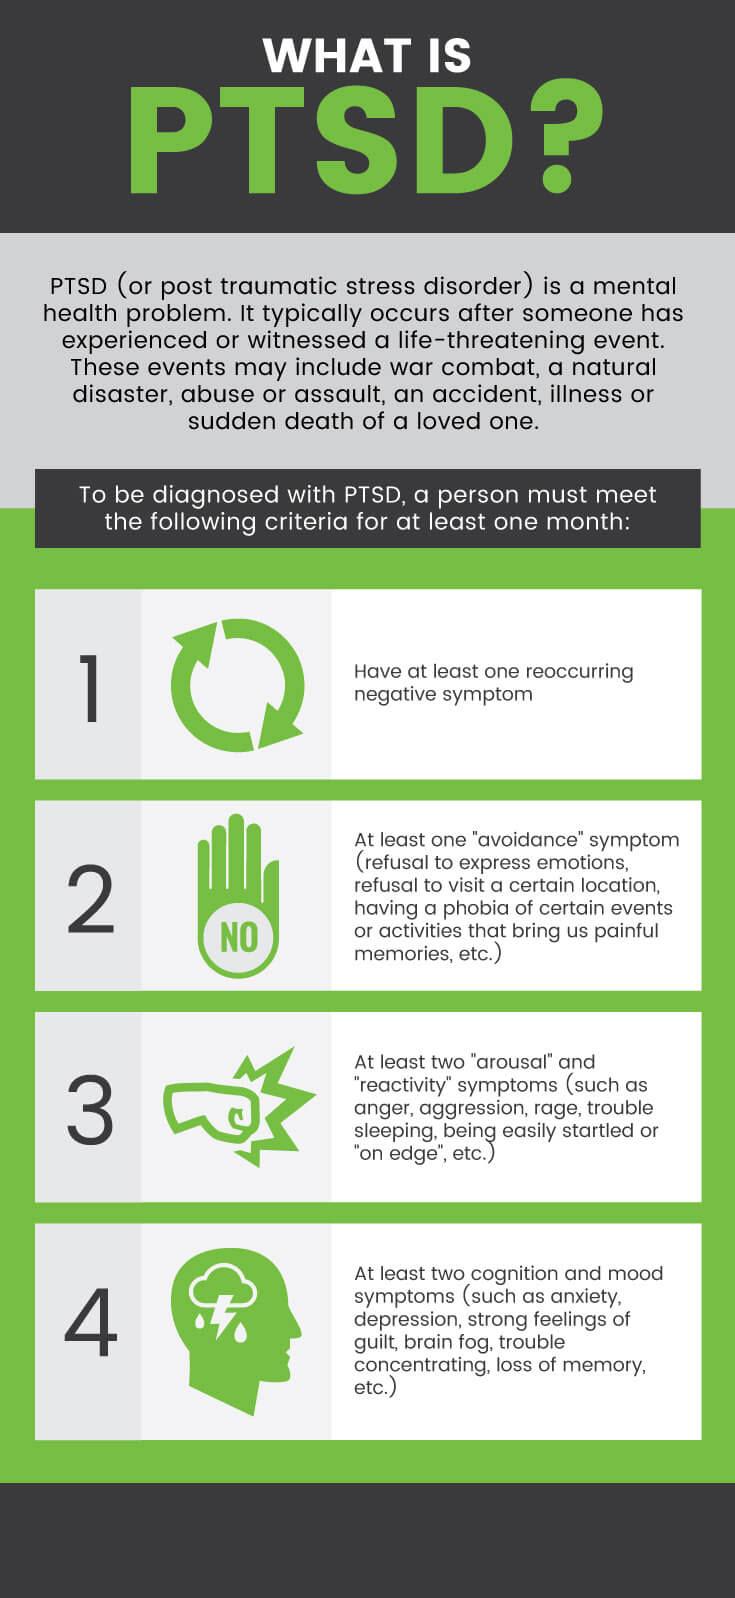 What are PTSD symptoms? - MKexpress.net